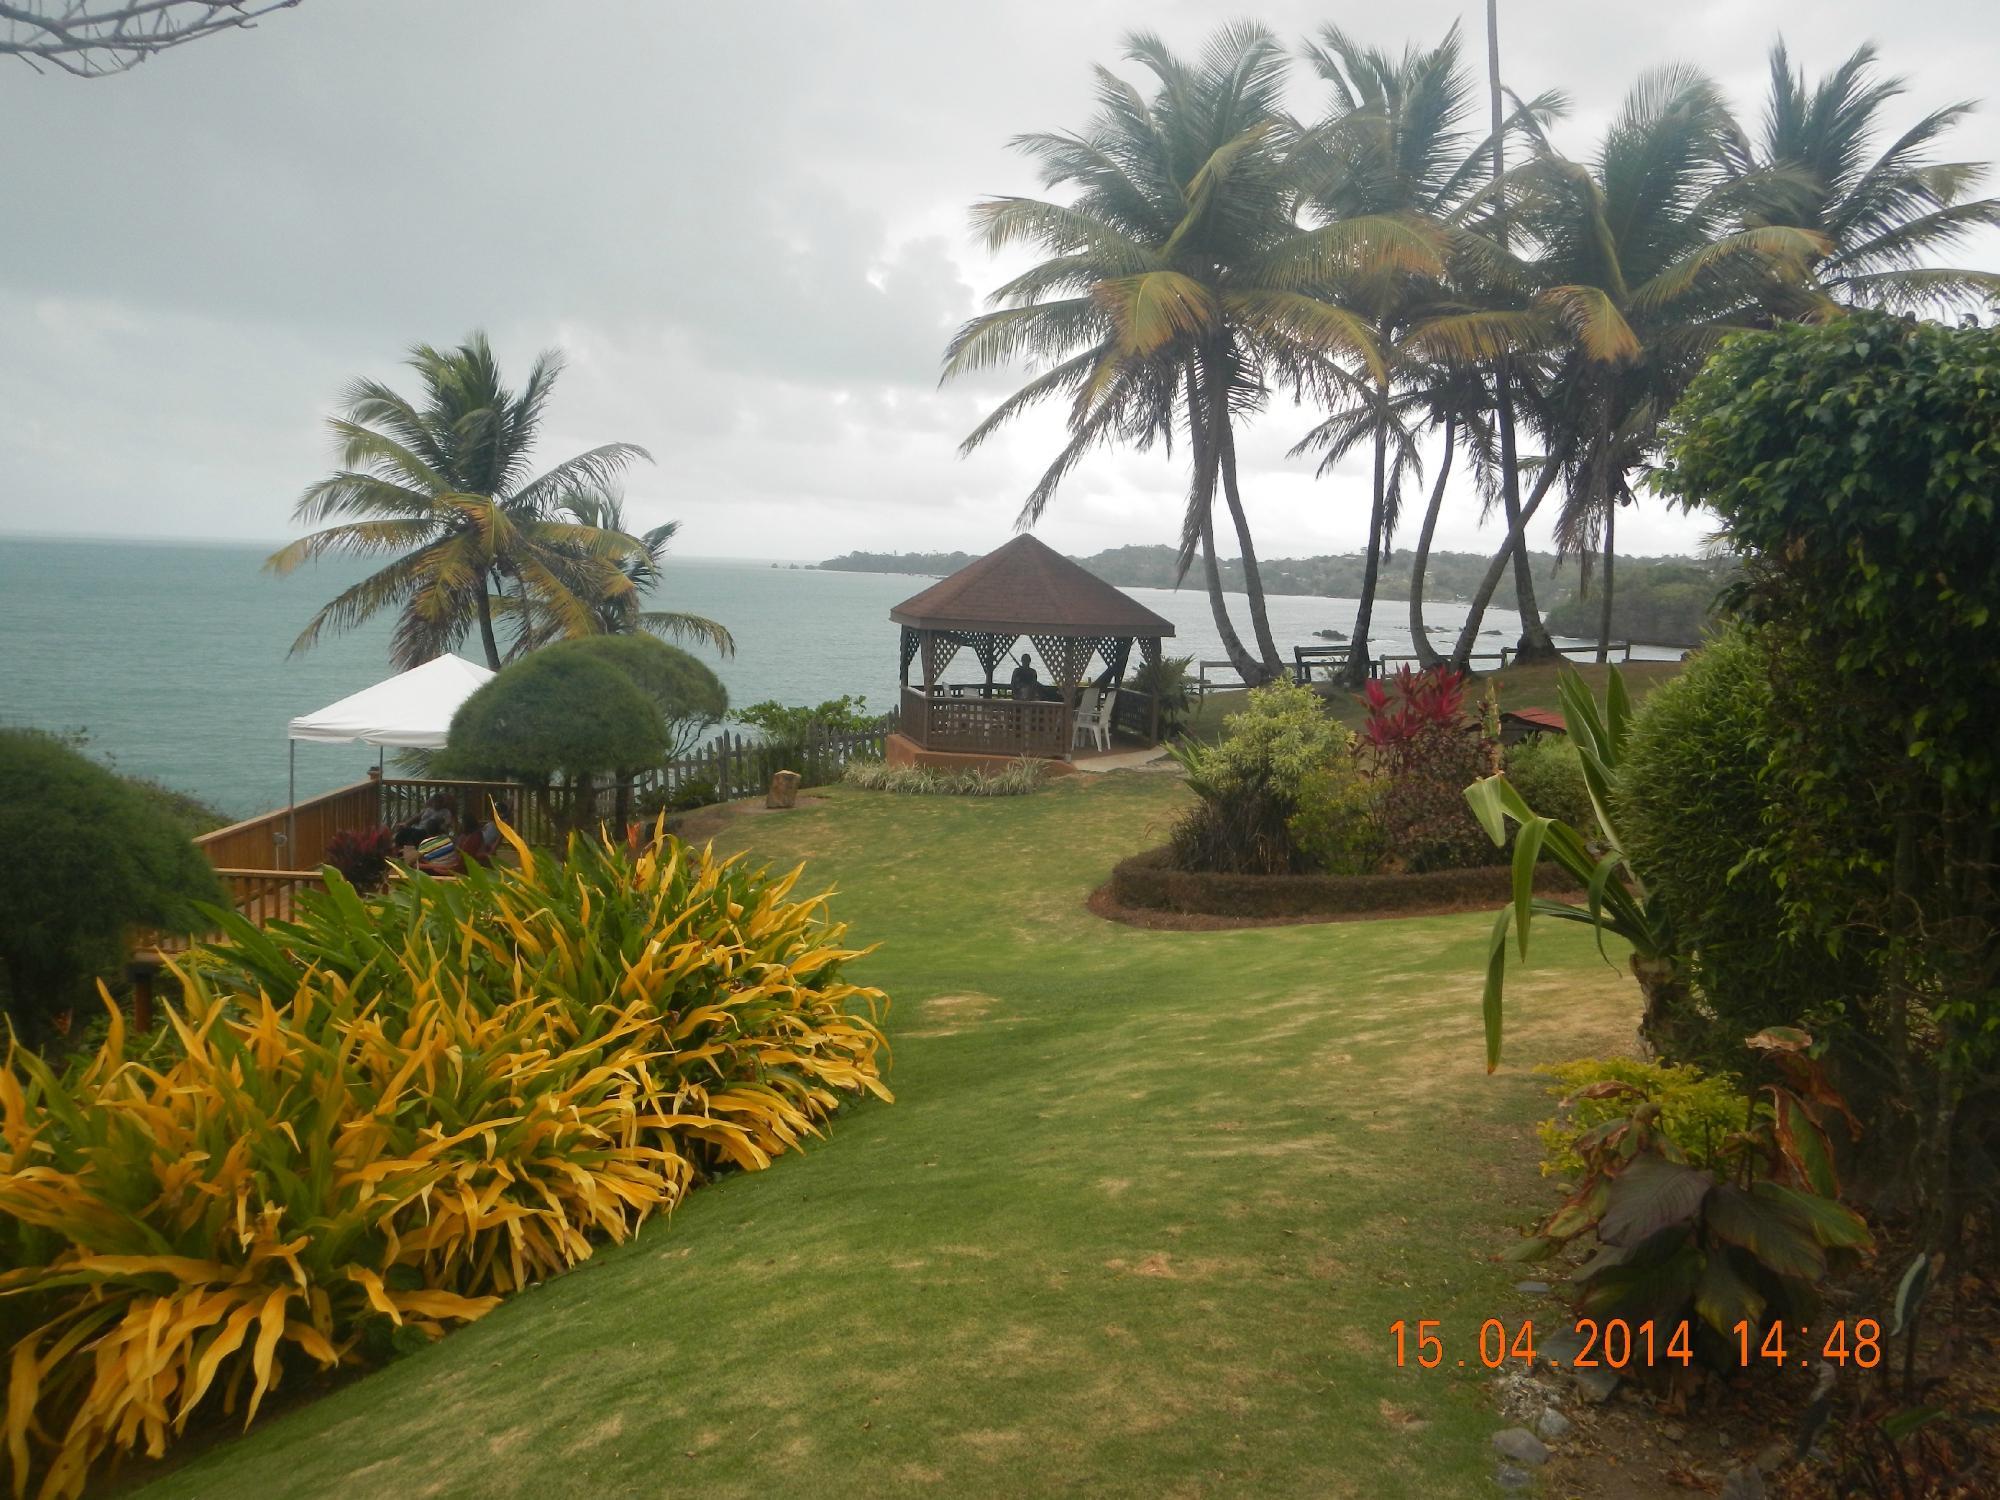 Hosanna Toco Resort